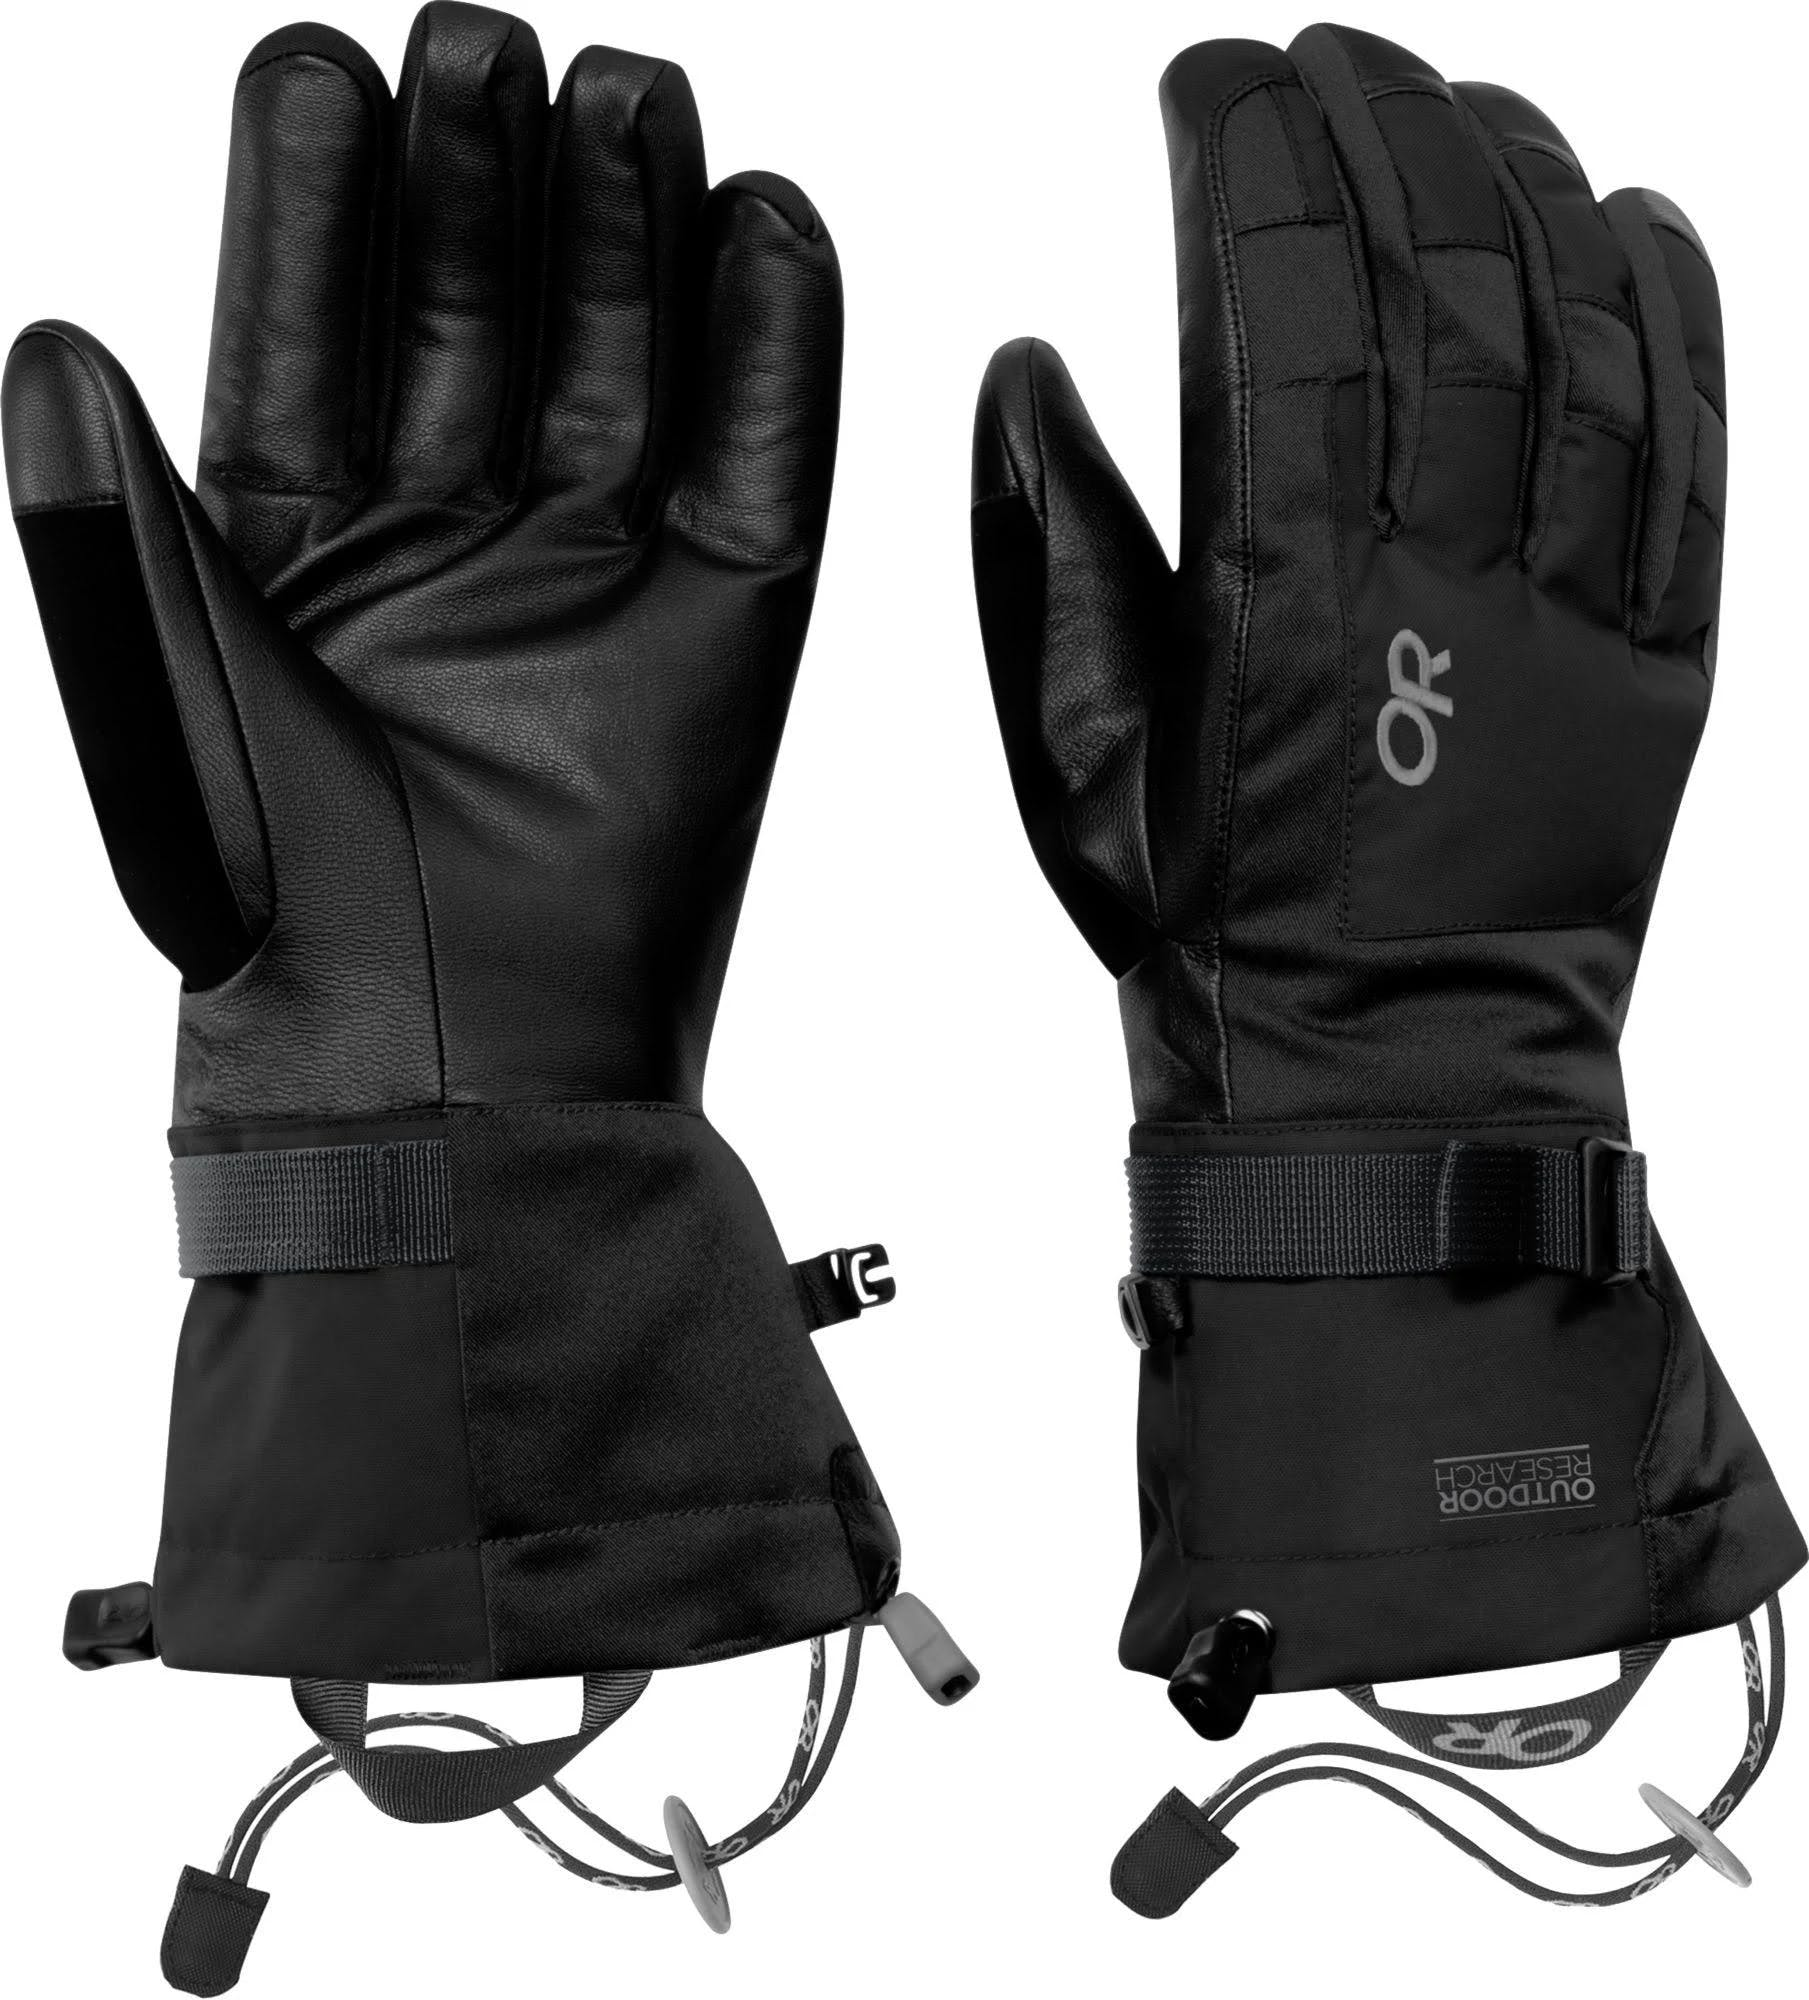 Outdoor Research Men's Revolution Gloves Black